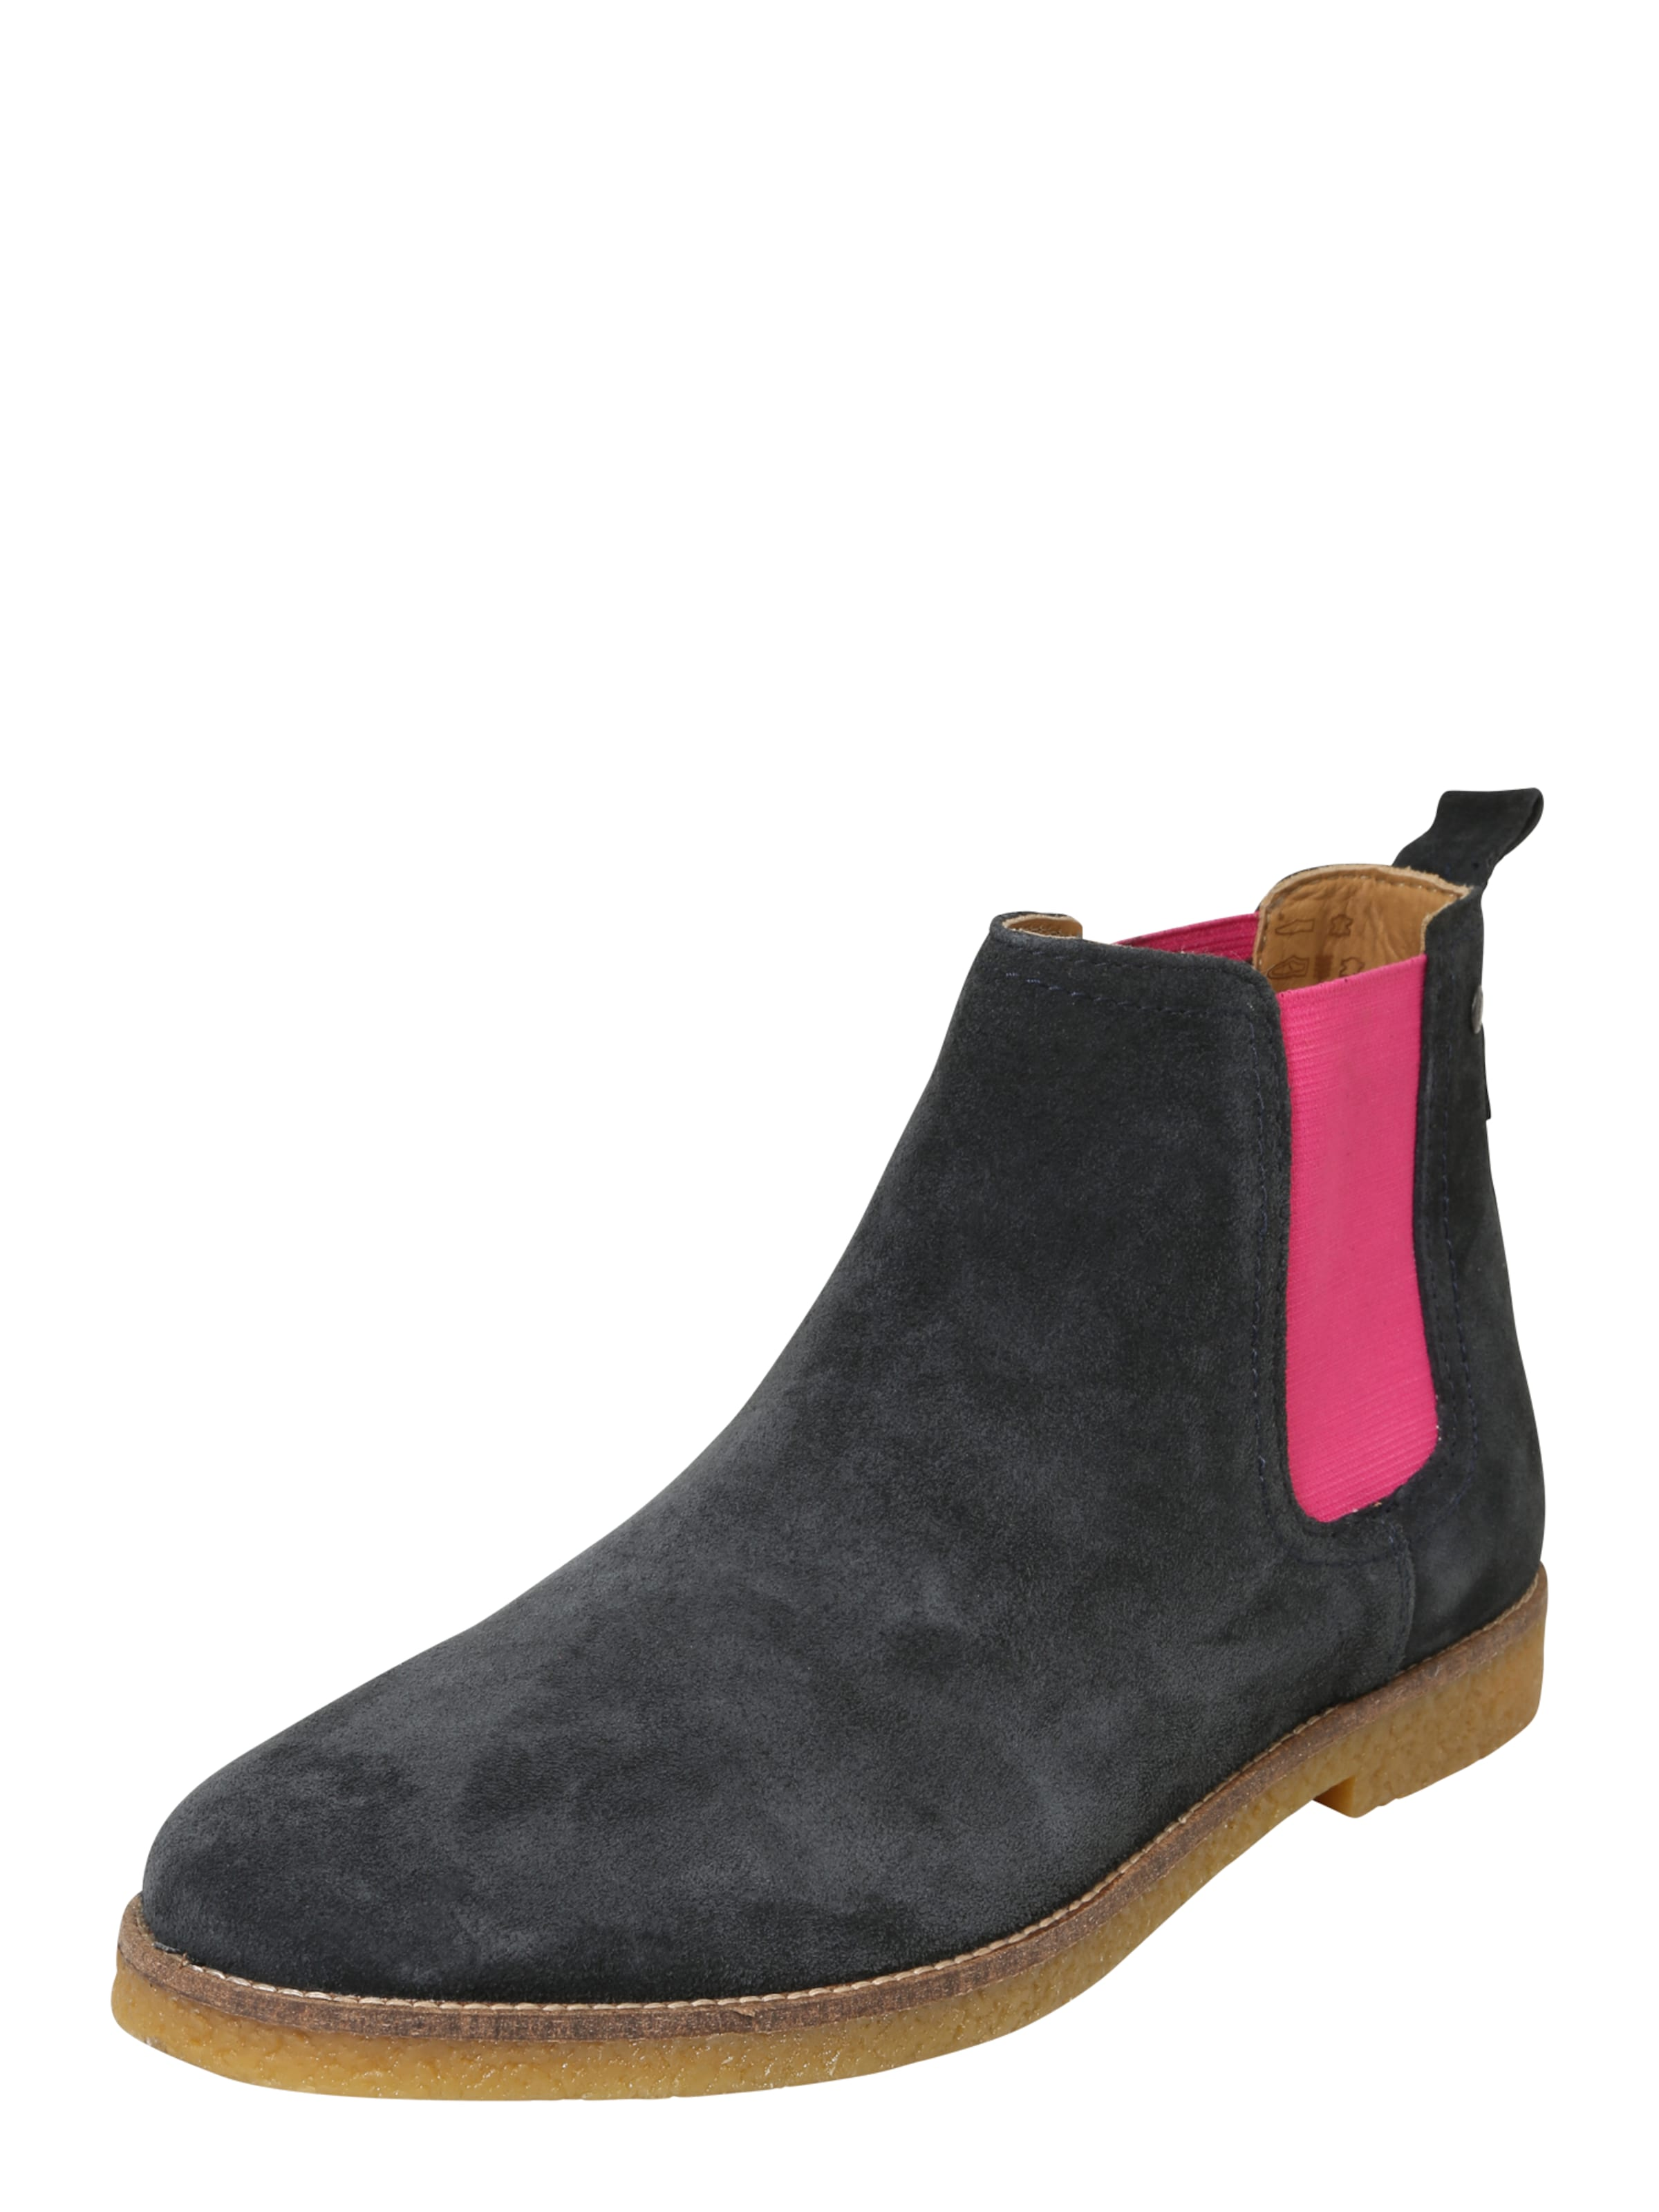 Schoon En Classic Base London Chelsea boots 'FERDINAND POP' navy / donkerroze Footlocker Te Koop Kopen Goedkope Hoeveel Lage Prijzen Populaire Online fxNY8kgLmR